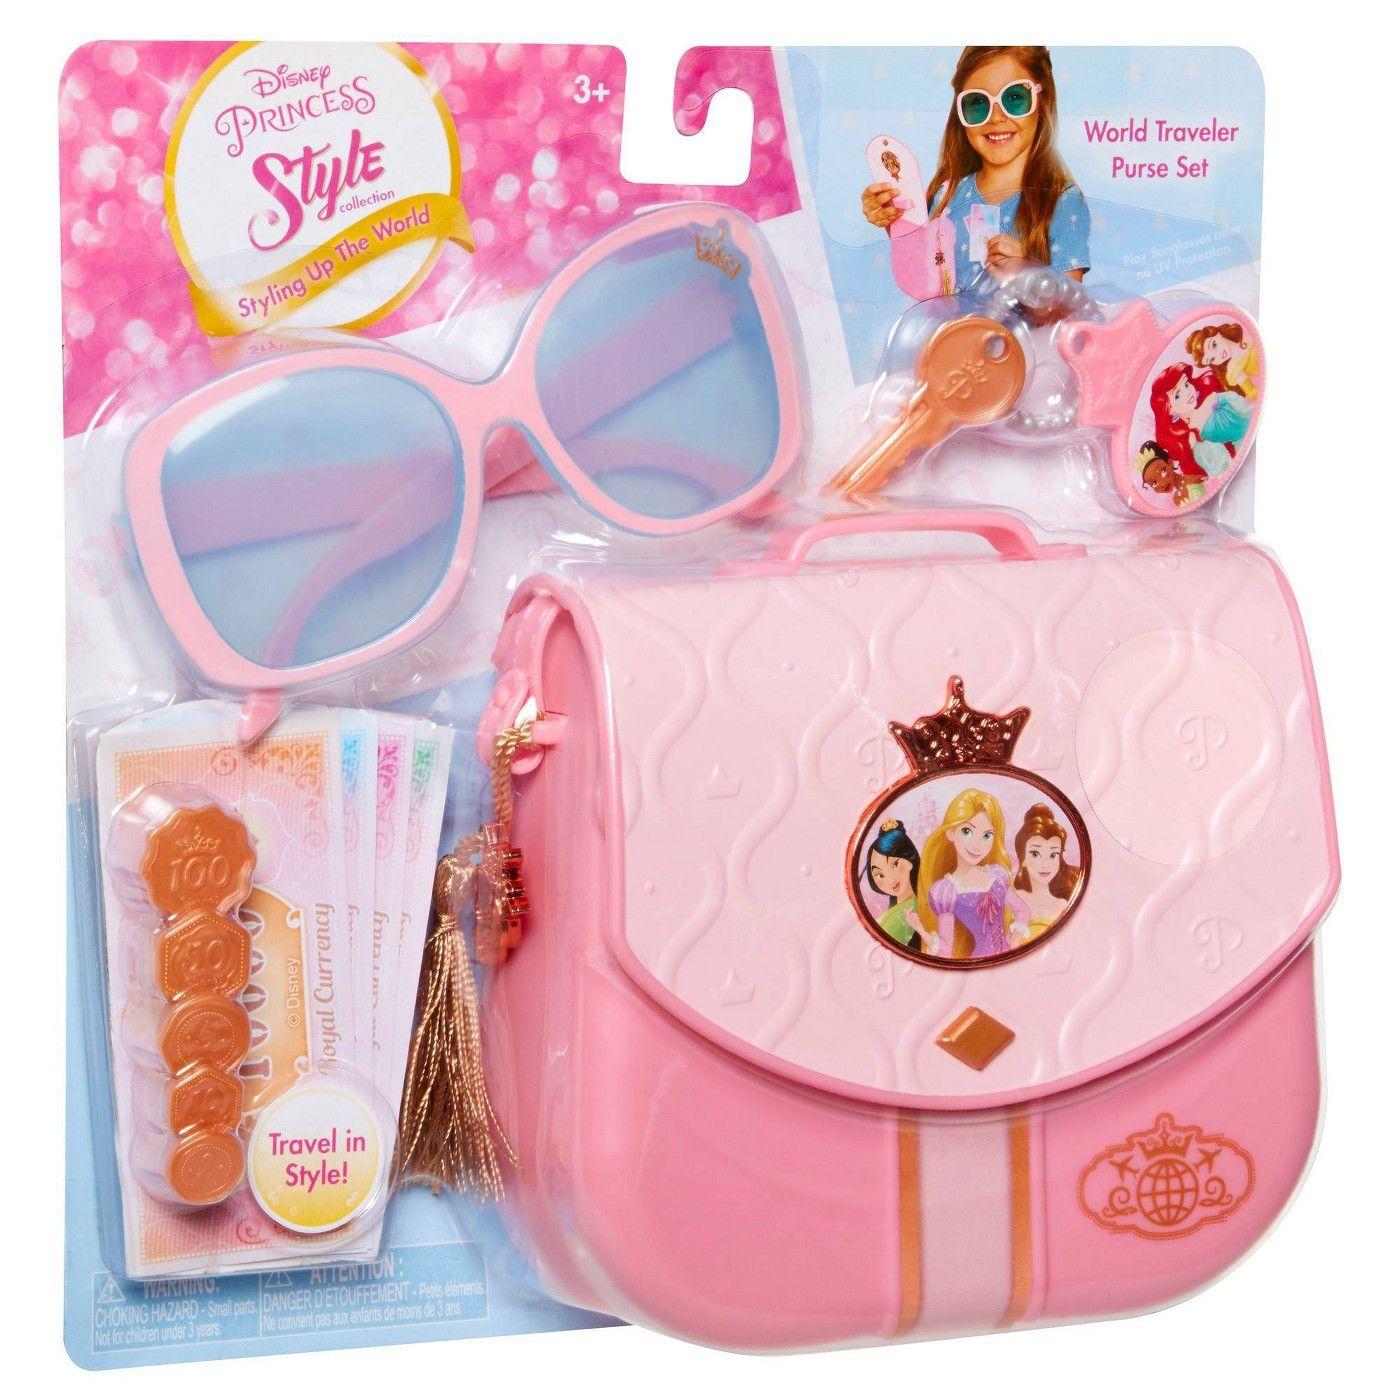 Disney Princess Style Collection World Traveler Purse Set In 2020 Disney Princess Toys Little Girl Toys Princess Toys